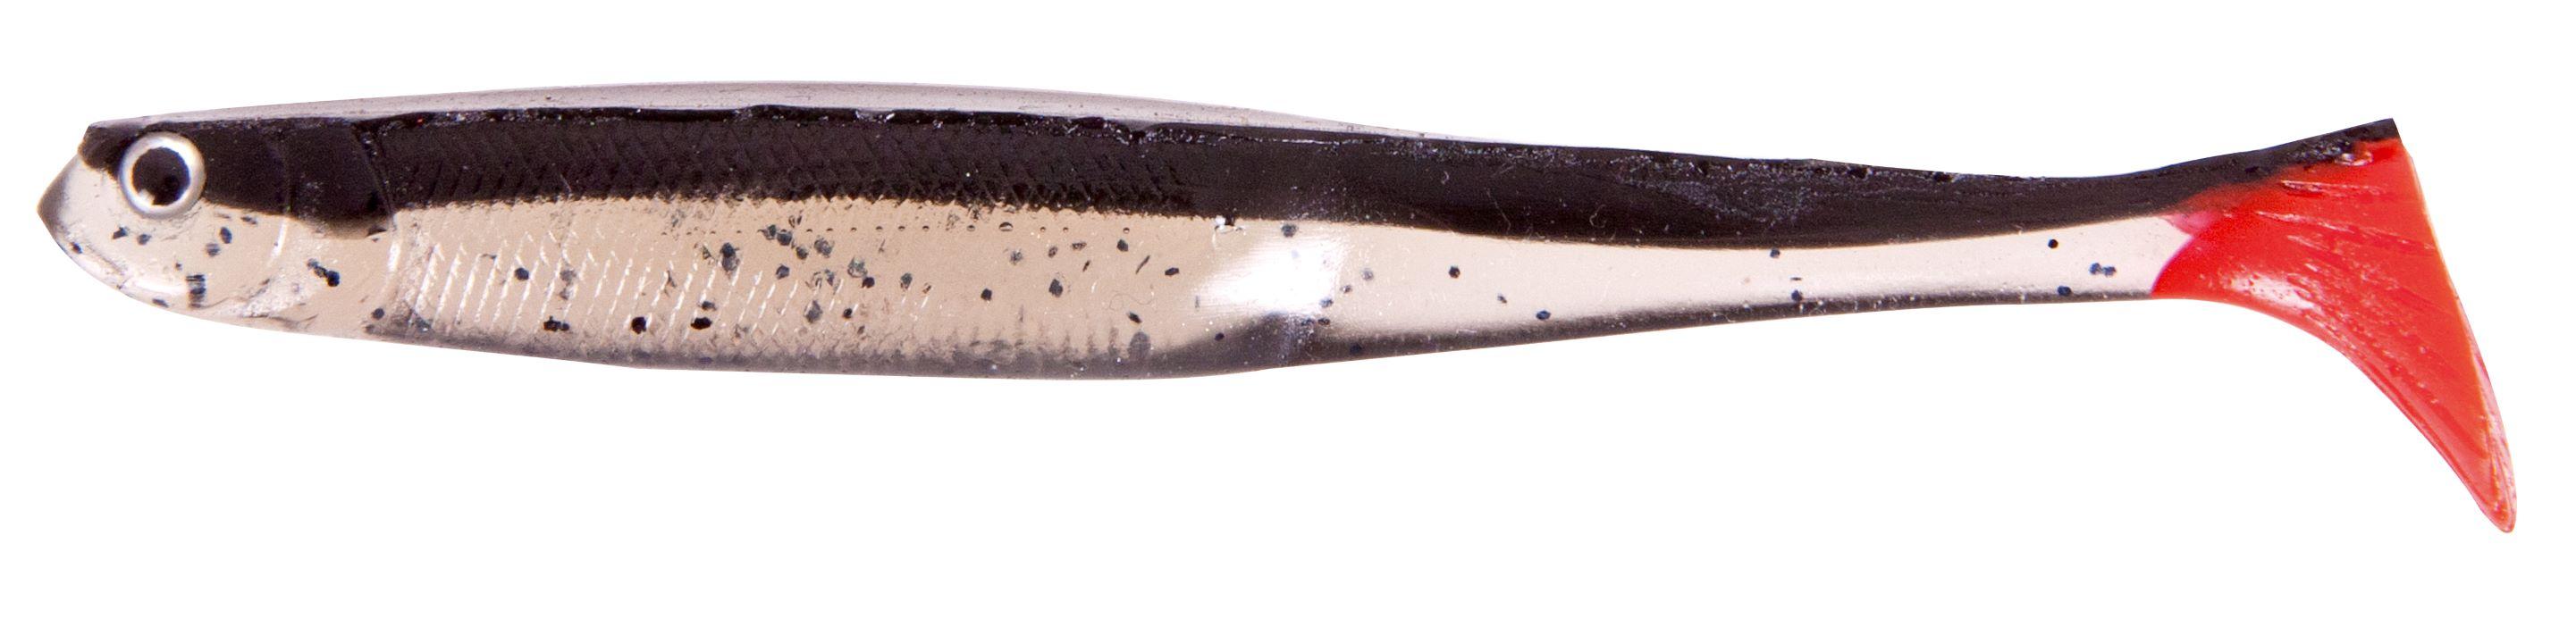 Iron Claw gumová nástraha Slim Jim 13 cm Vzor CB, 3ks